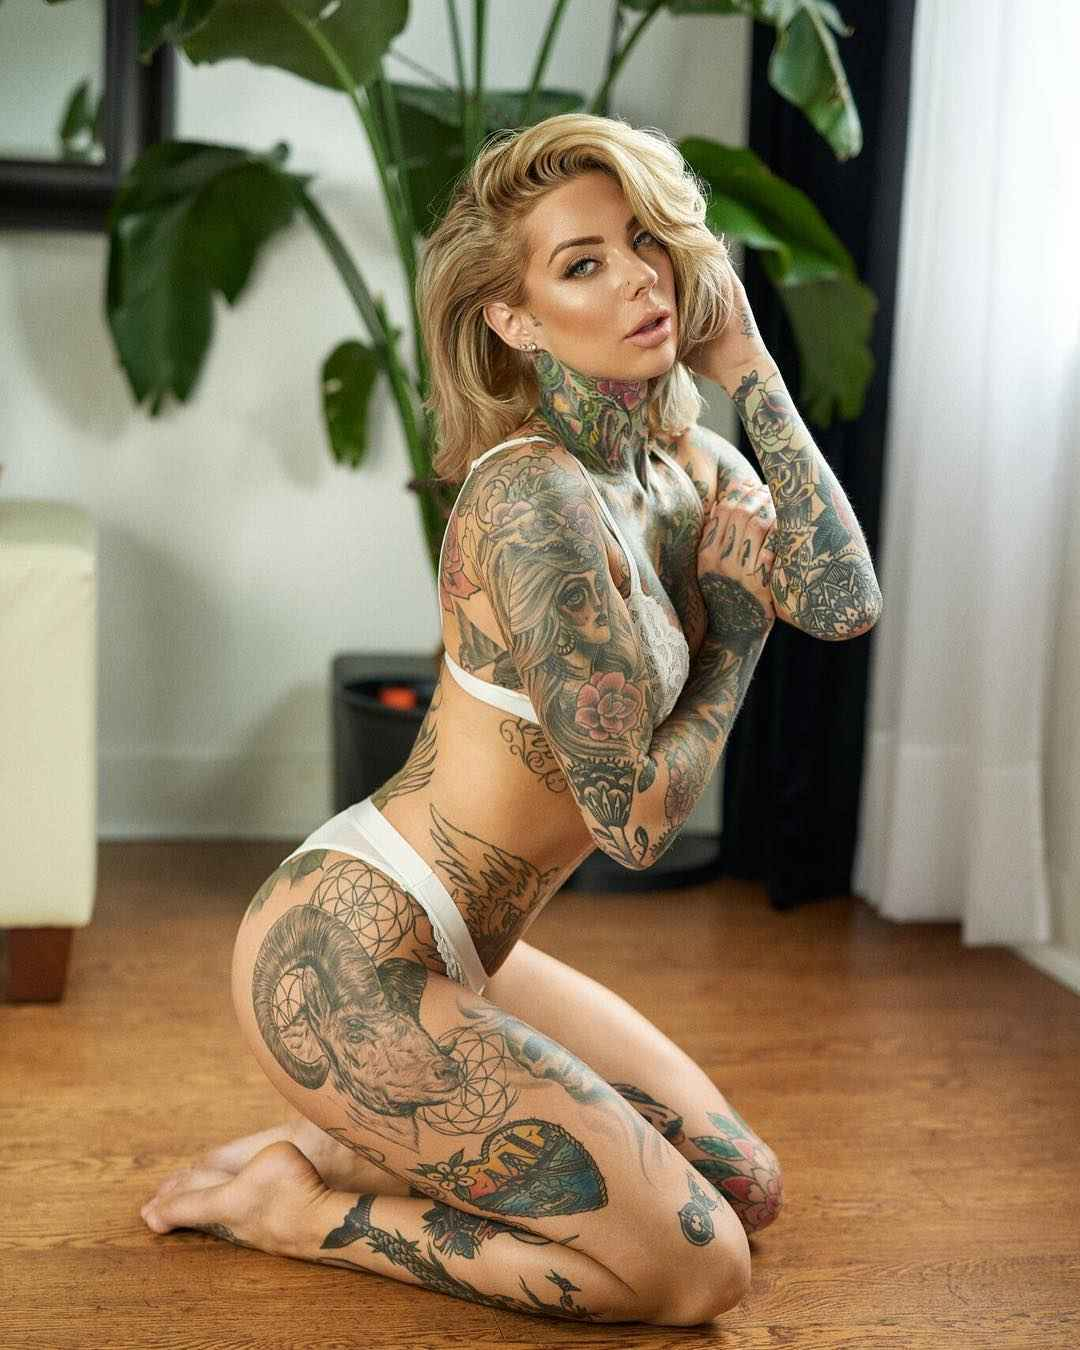 Inked sexy and nude women, girl asian ritual